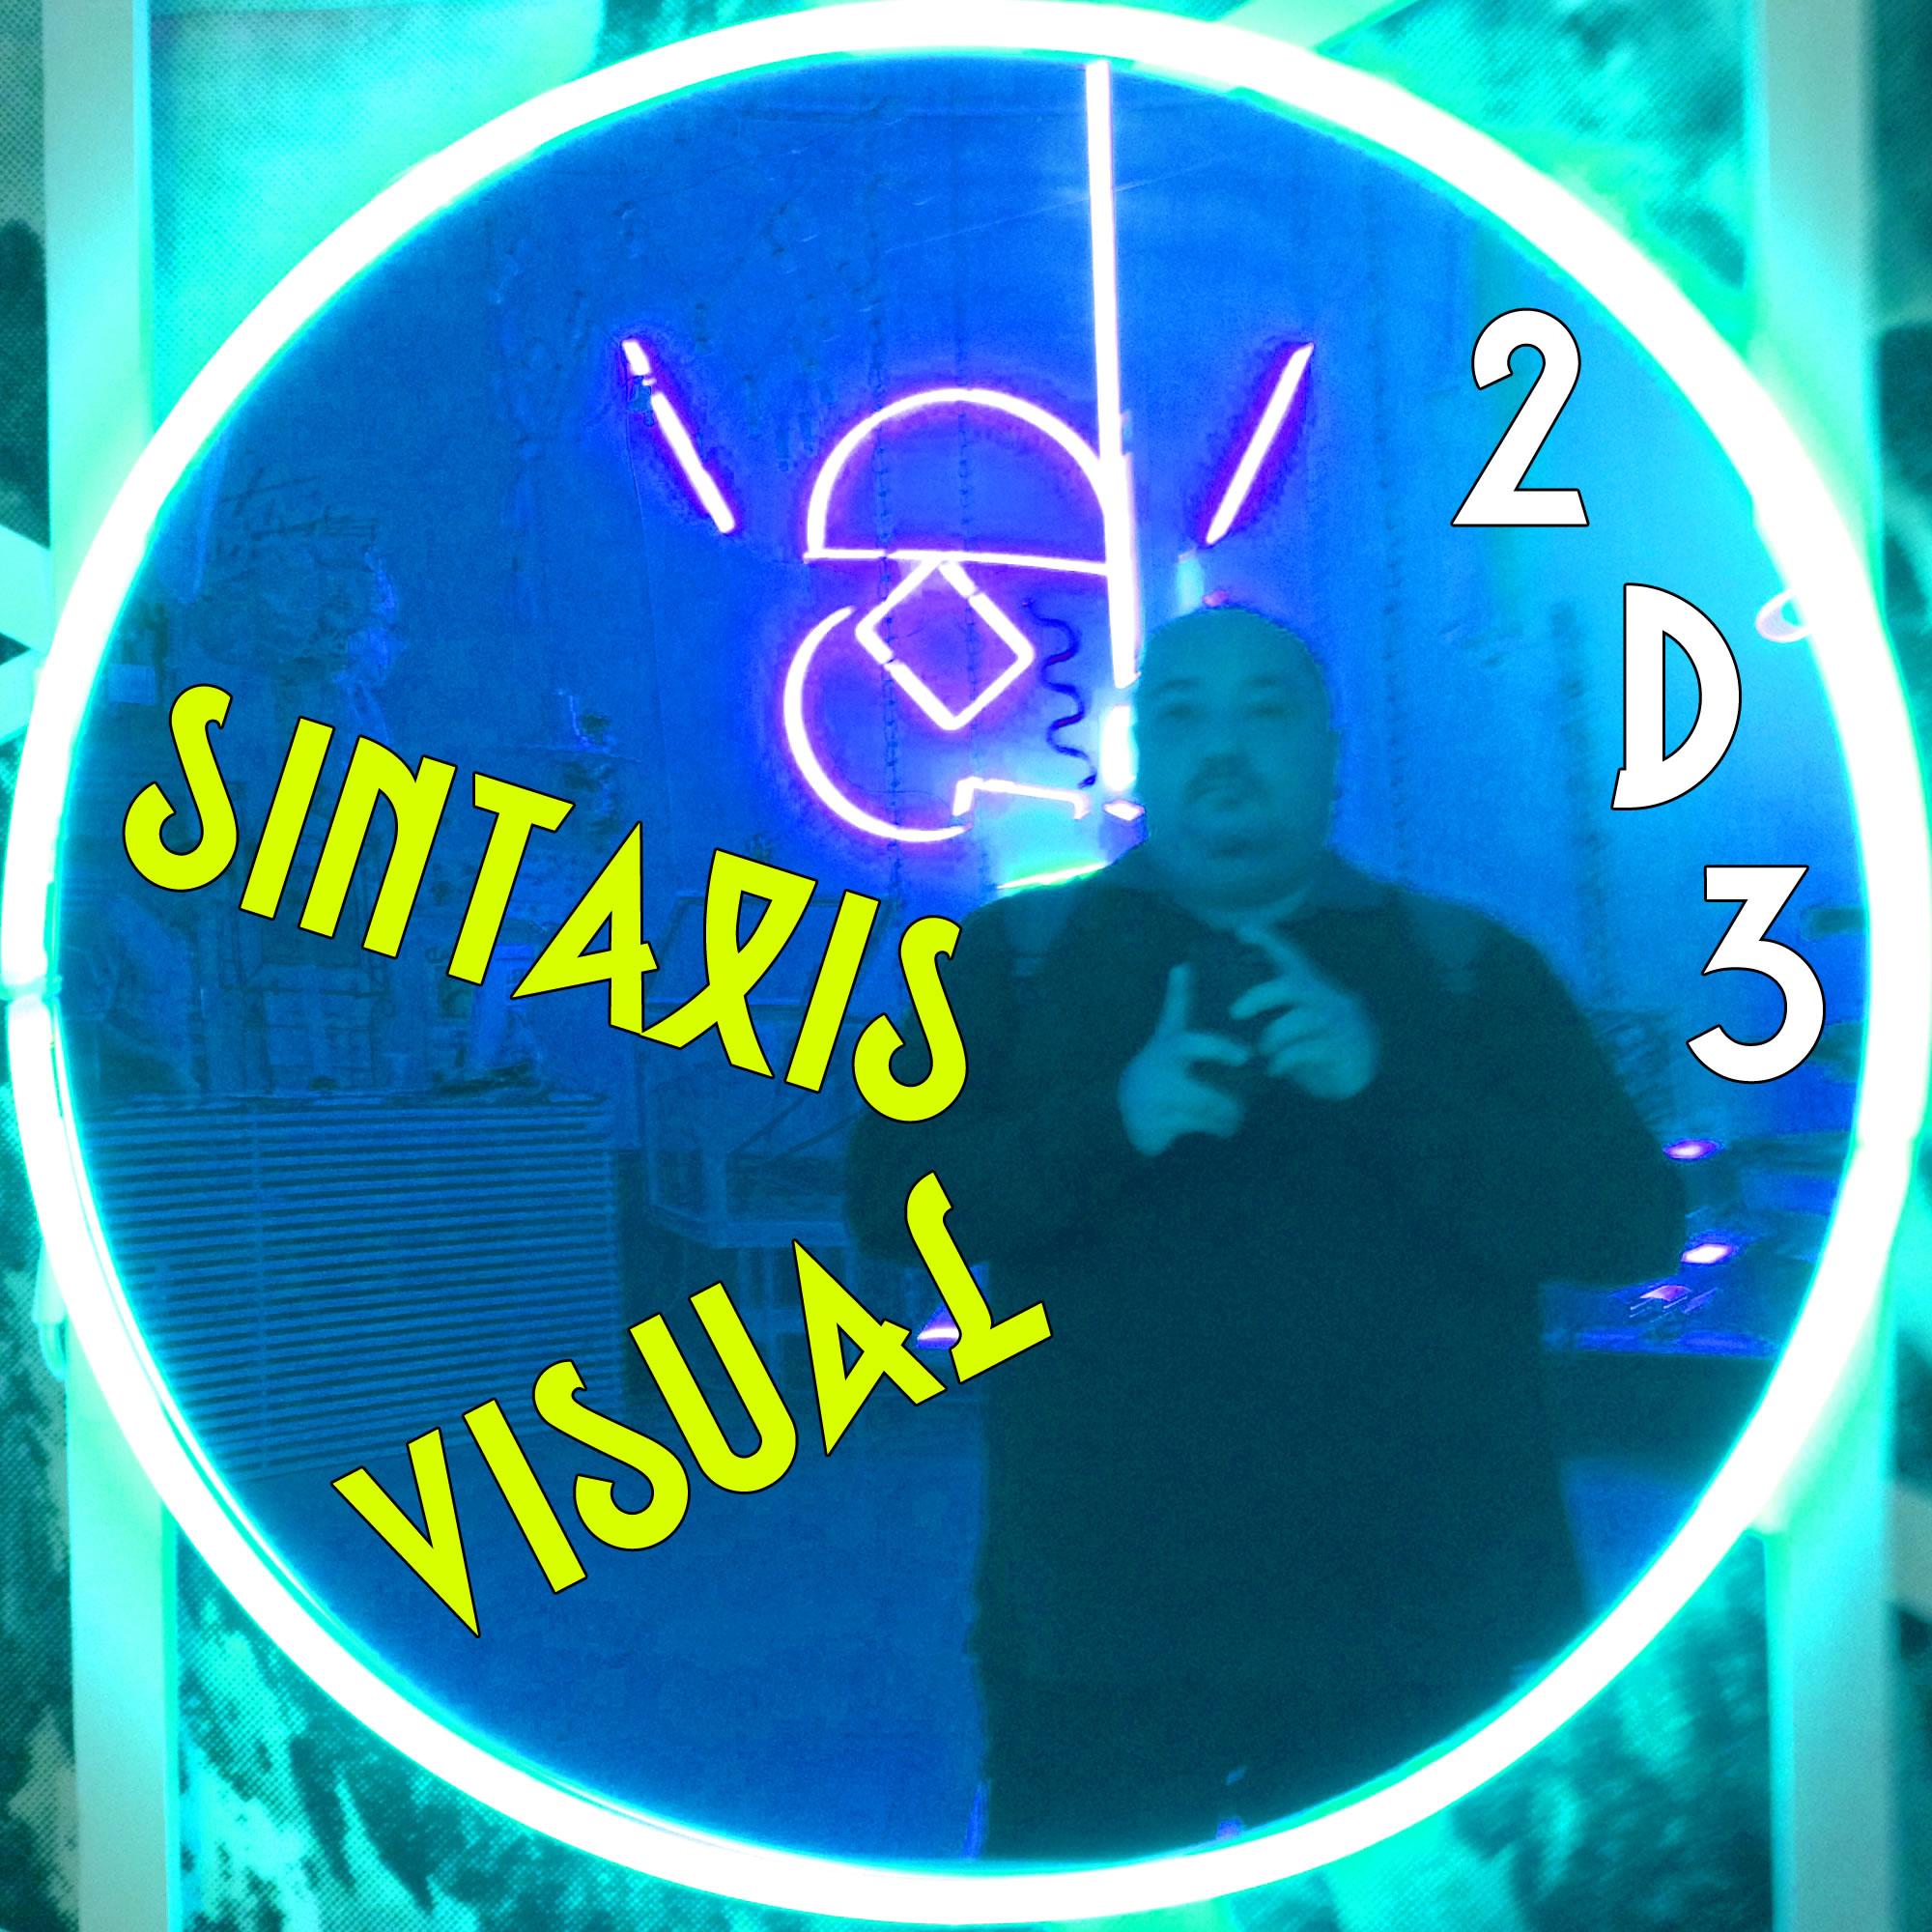 50 - Sintaxis Visual tecnicas de composicion parte 2 de 3